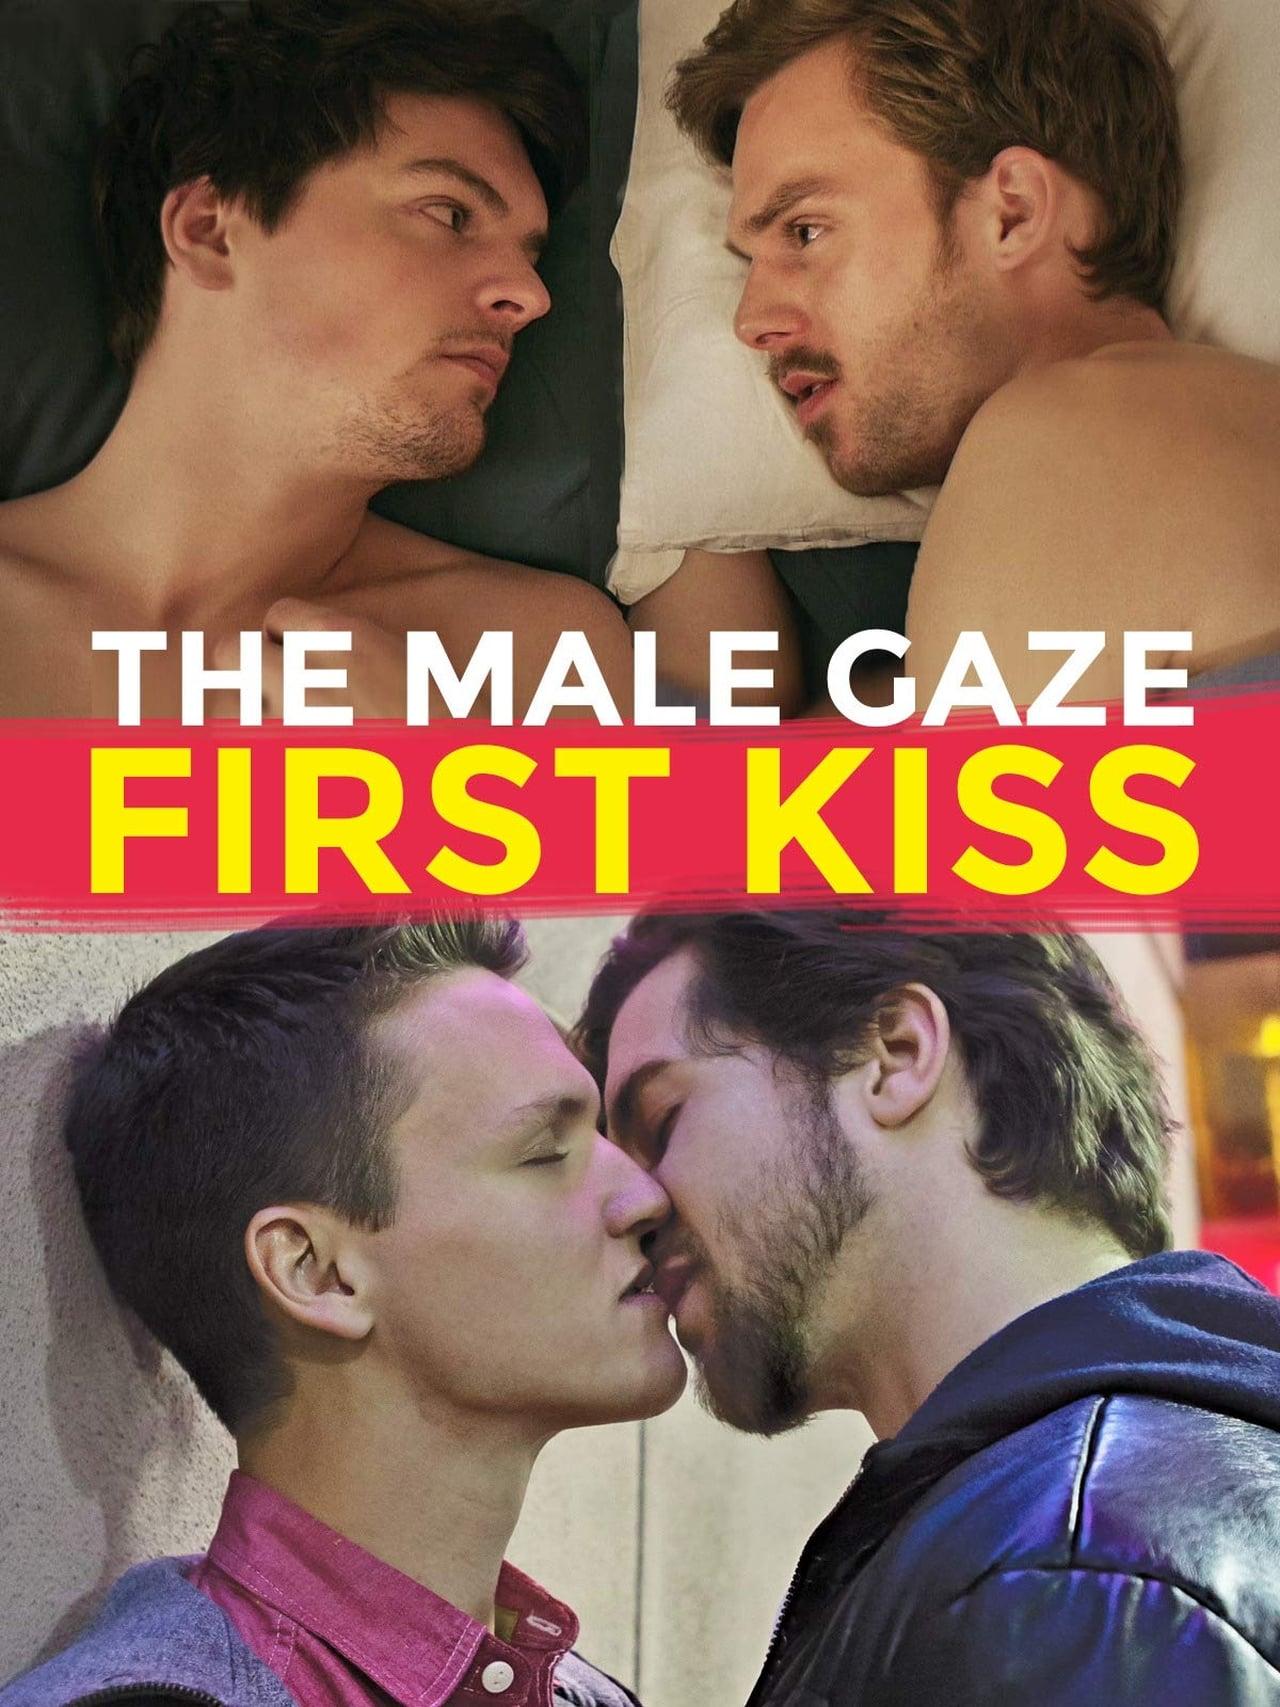 The Male Gaze: First Kiss